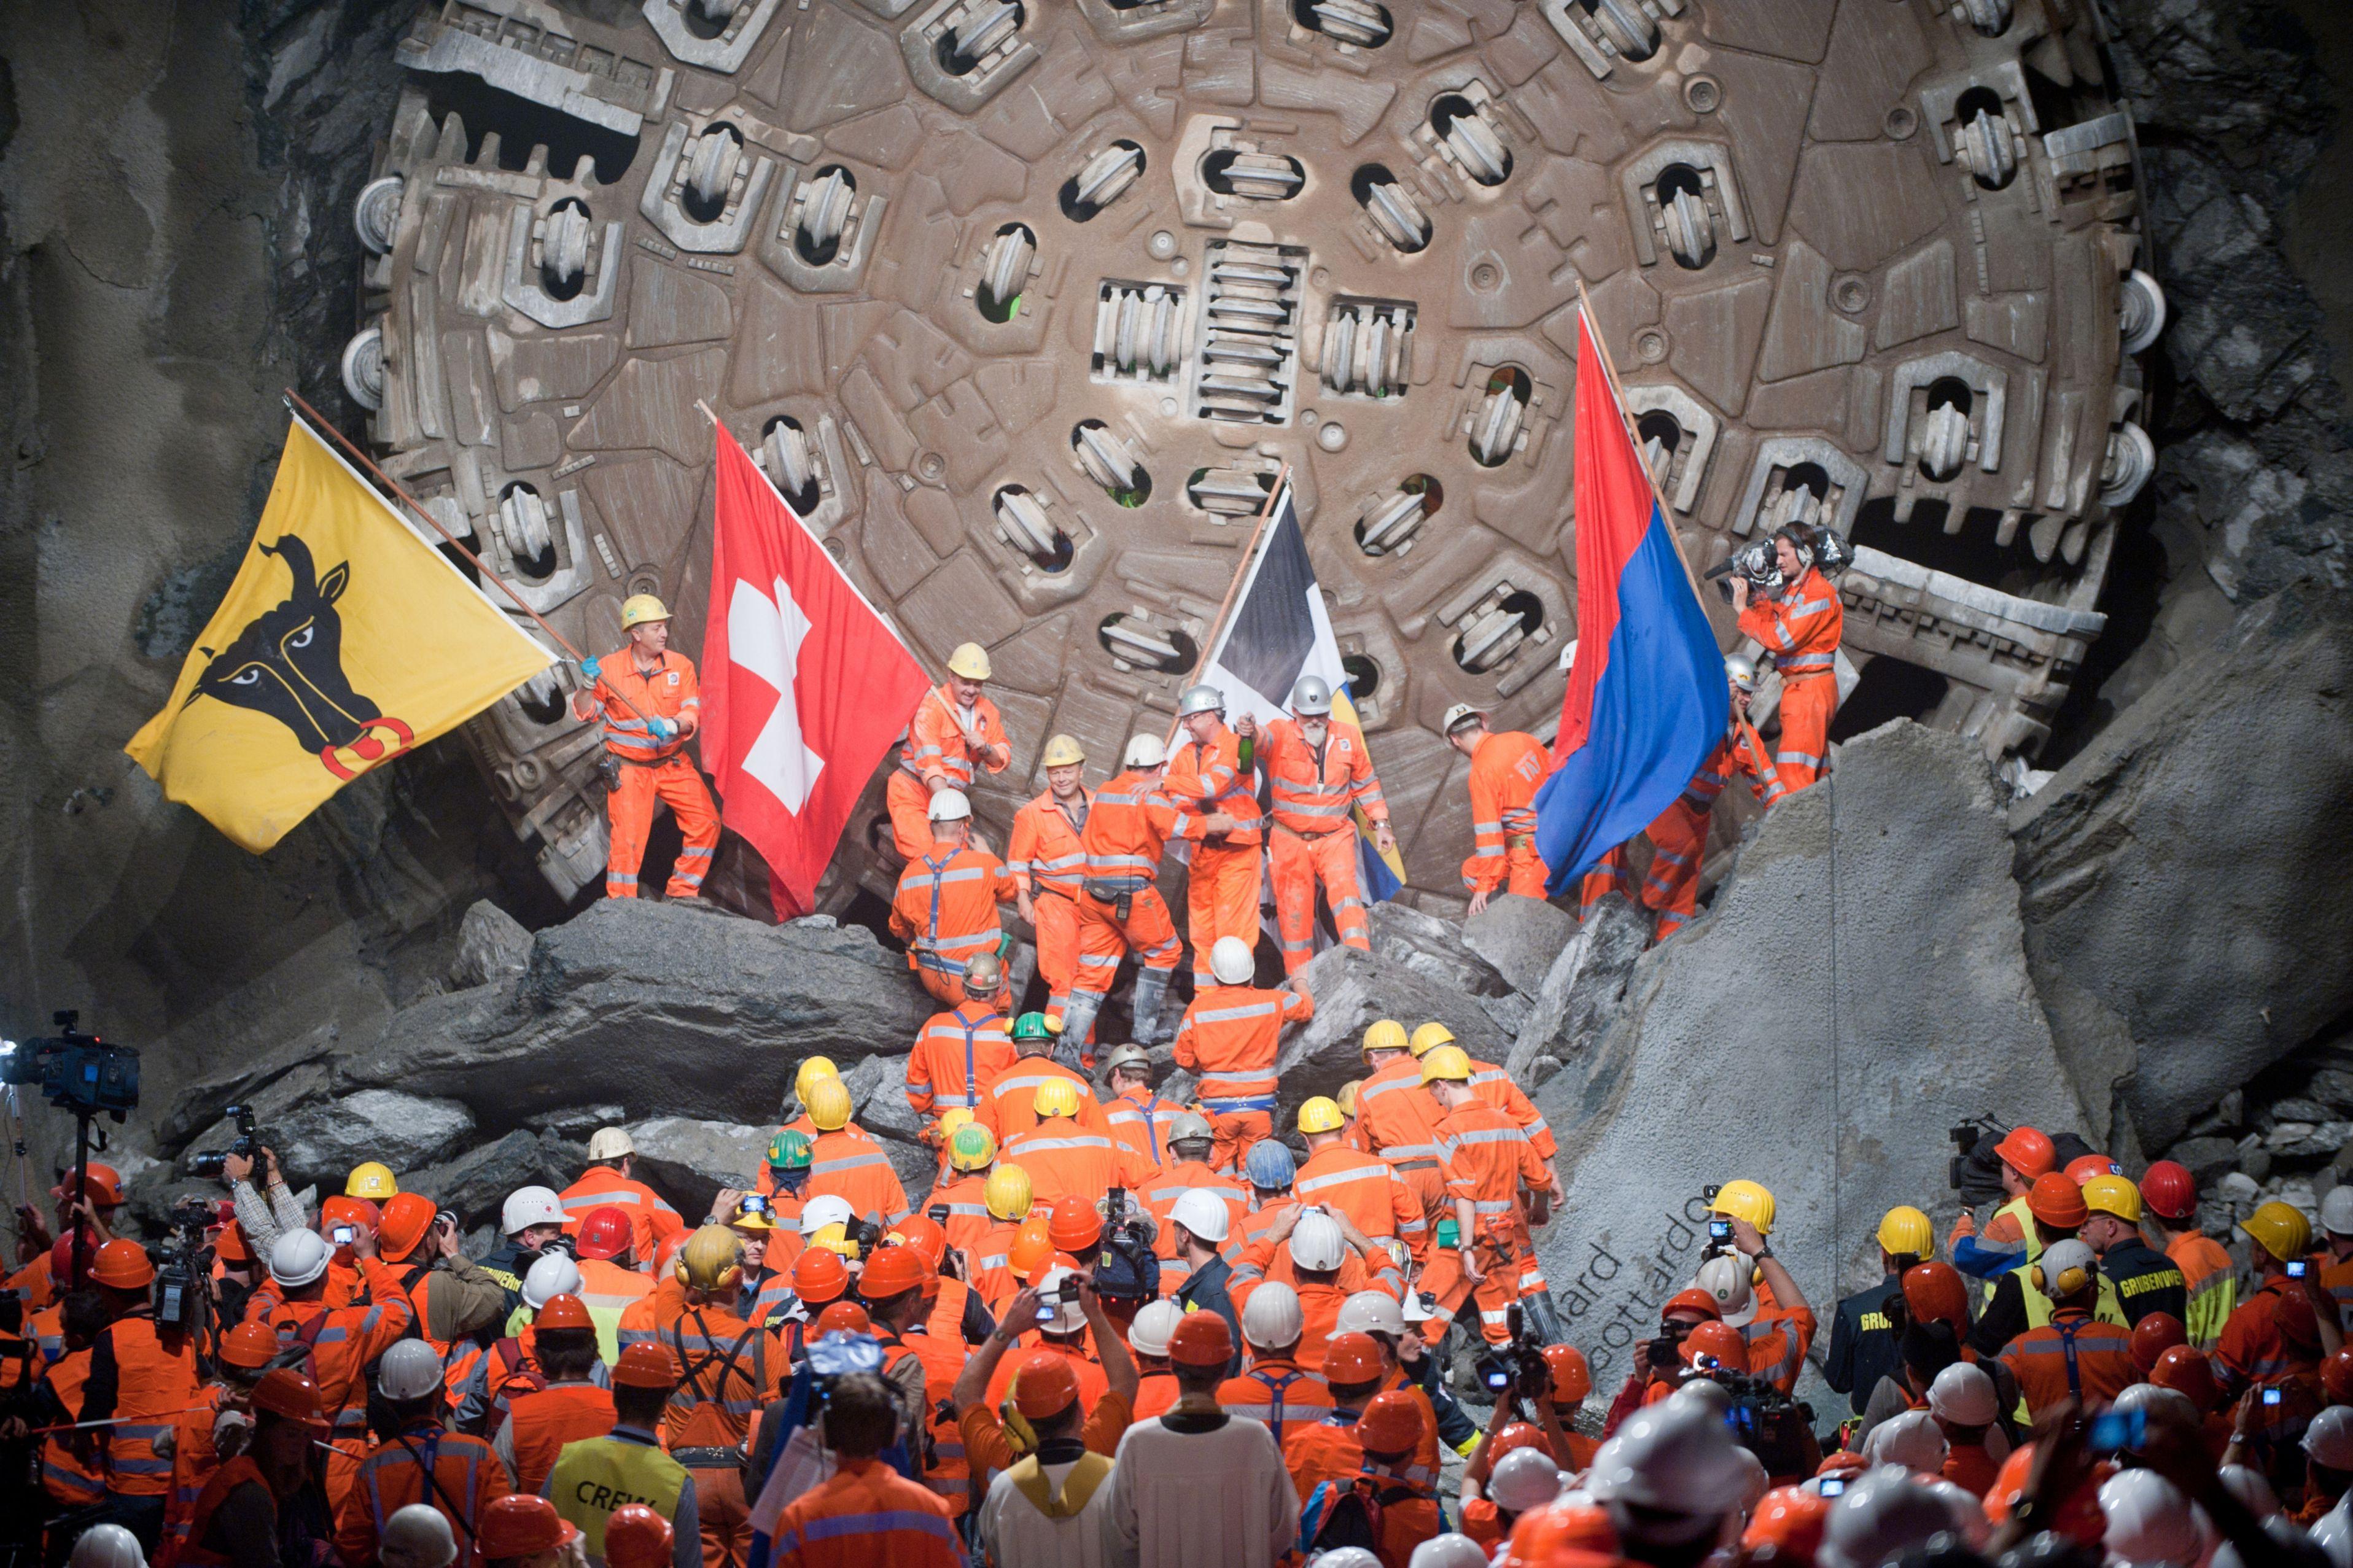 Construction workers celebrating inside Gotthard Tunnel in Switzerland